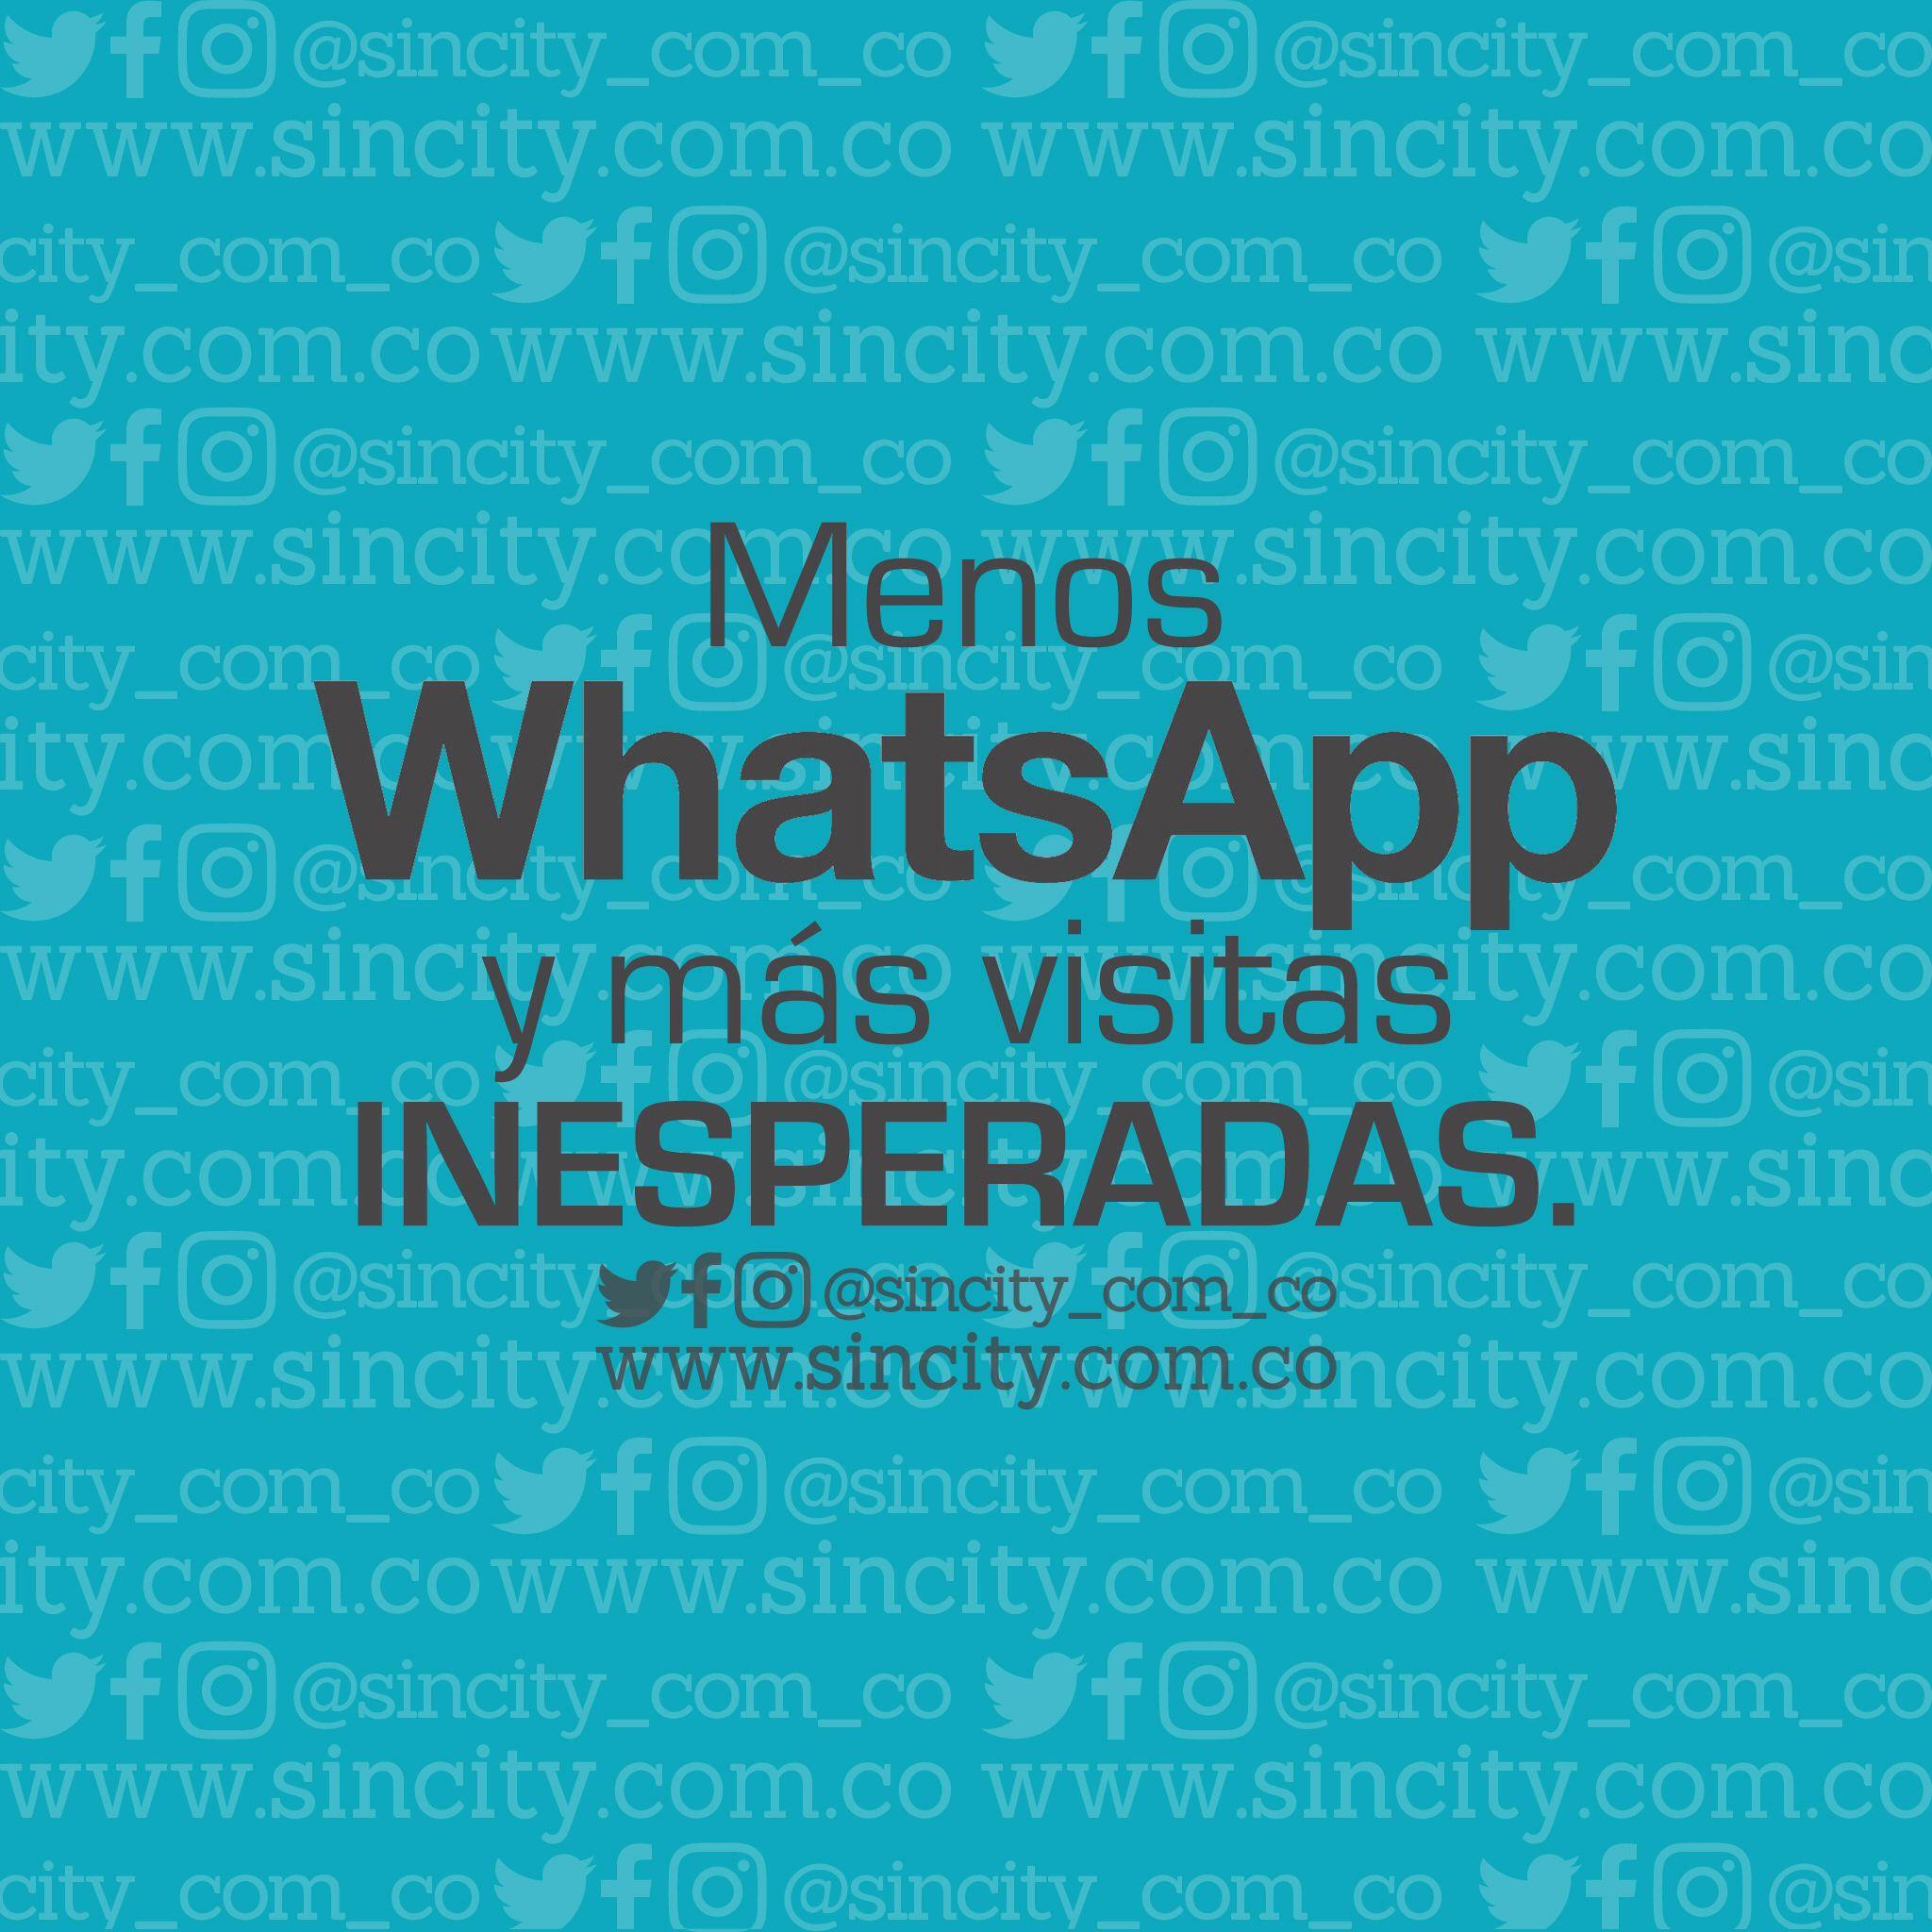 ¡Eso!  #frases #frasessincity #sincity #sincitycolombia #colombia #whatsapp #menoswhatsapp #visita #visitas #visitasinesperadas #esoqueremos